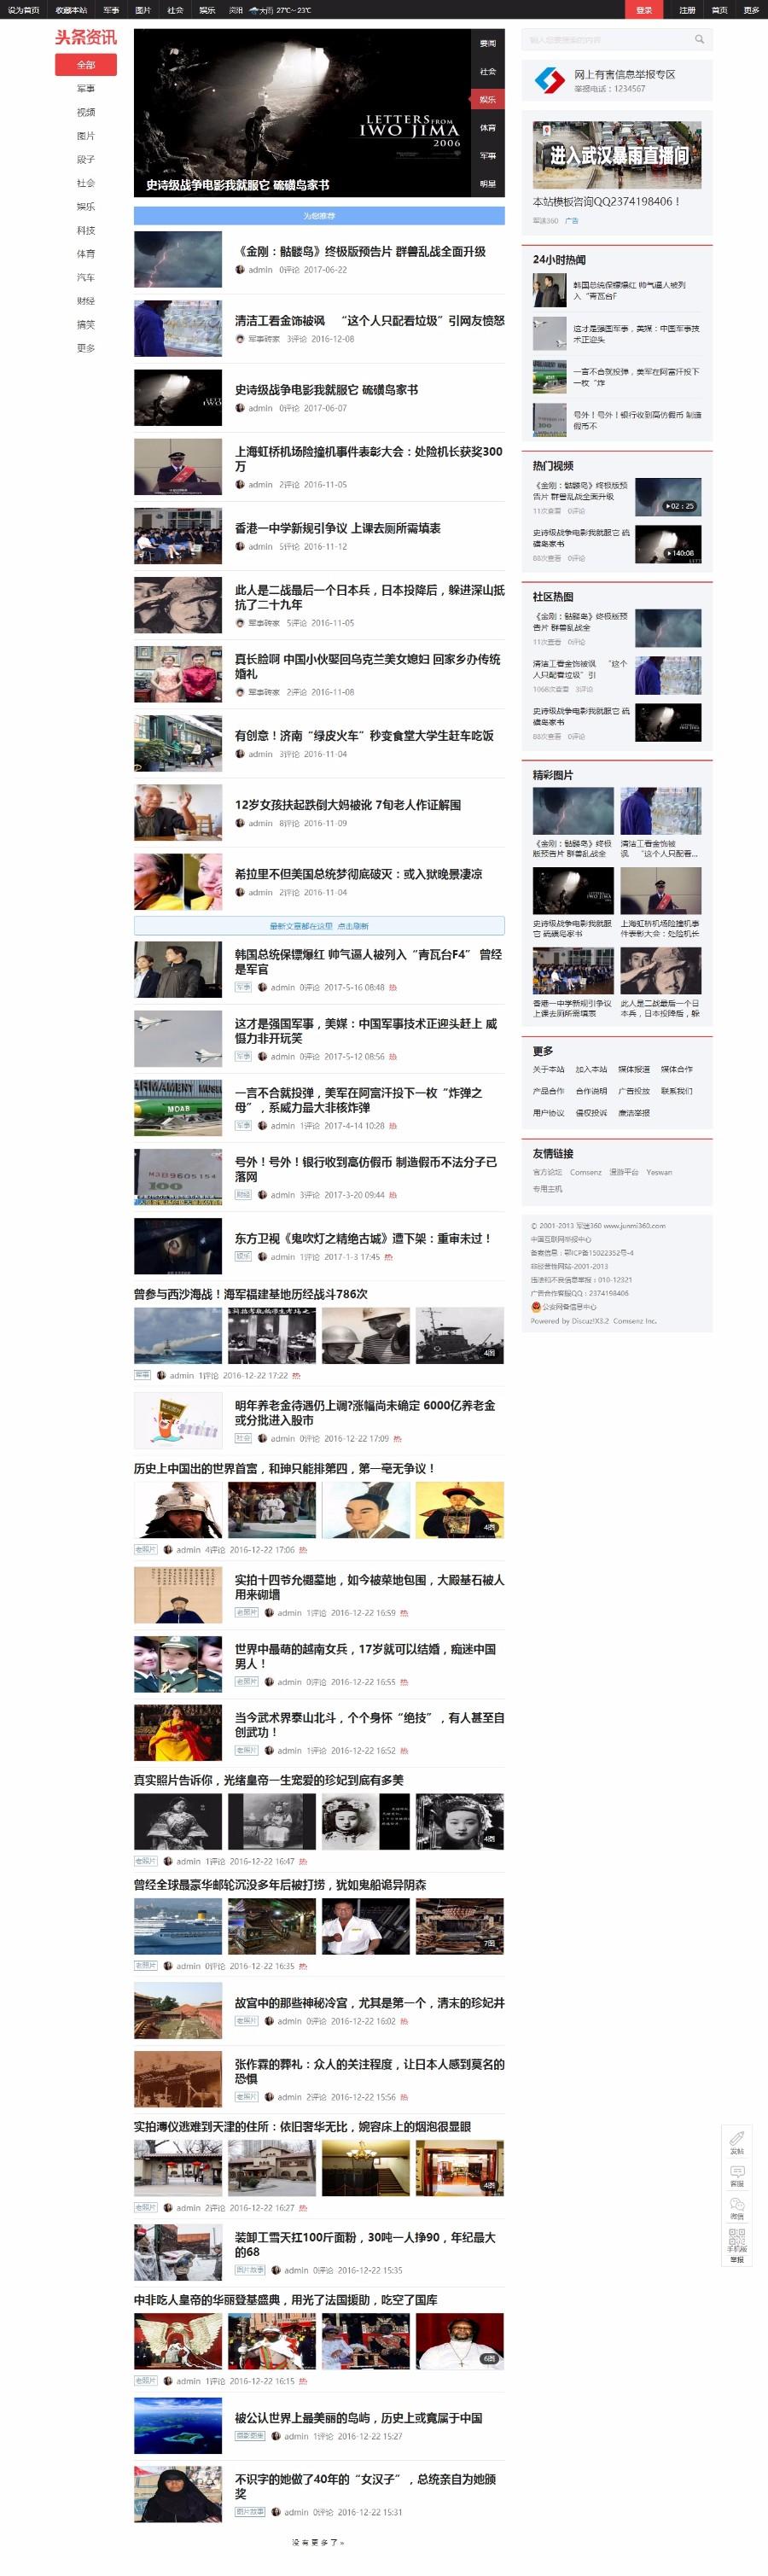 【discuz模板下载】仿今日头条新闻资讯带手机端网站模板 GBK+UTF8(整站源码分享)